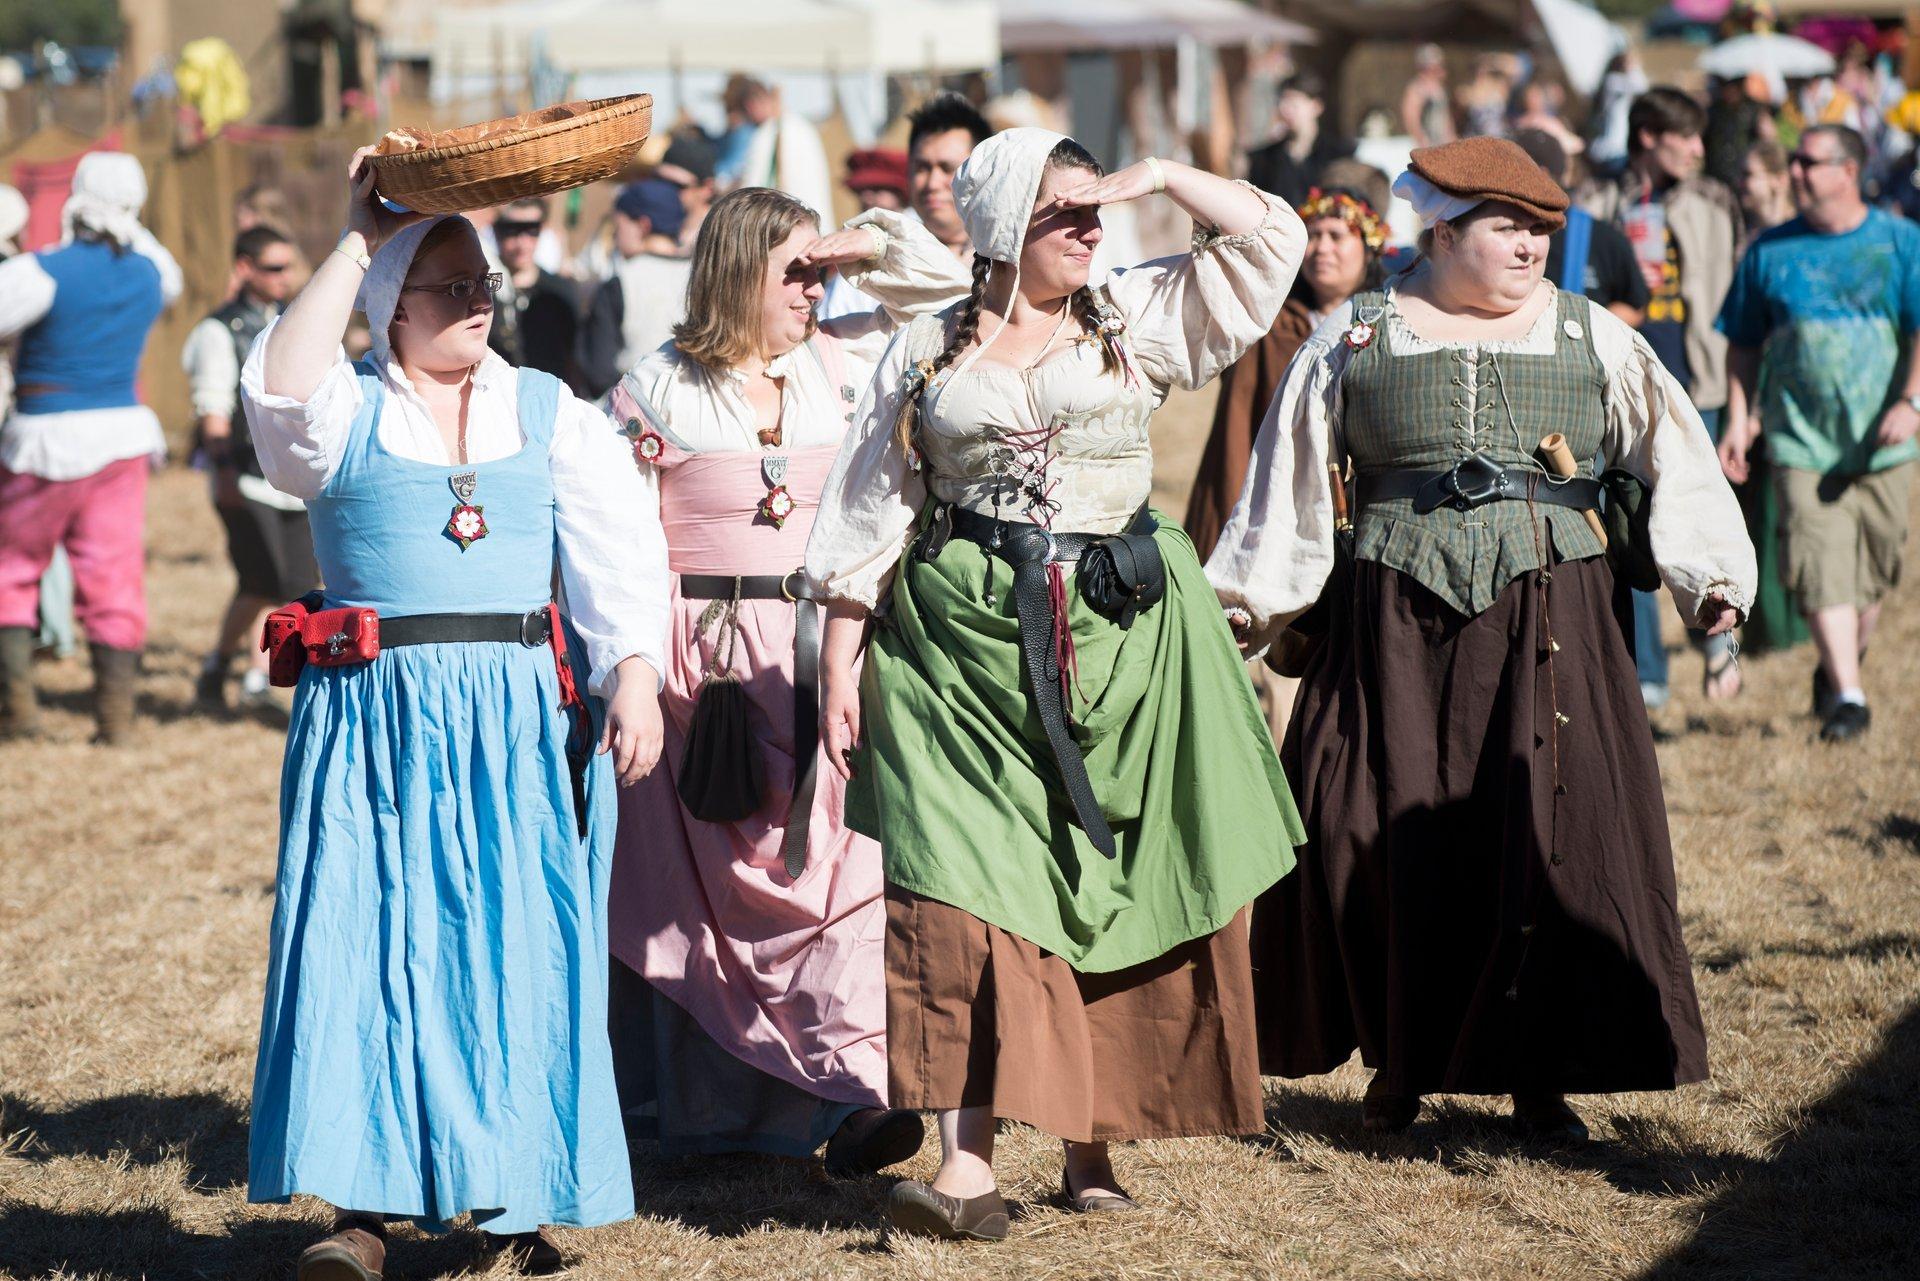 Best time for Shrewsbury Renaissance Faire in Oregon 2020